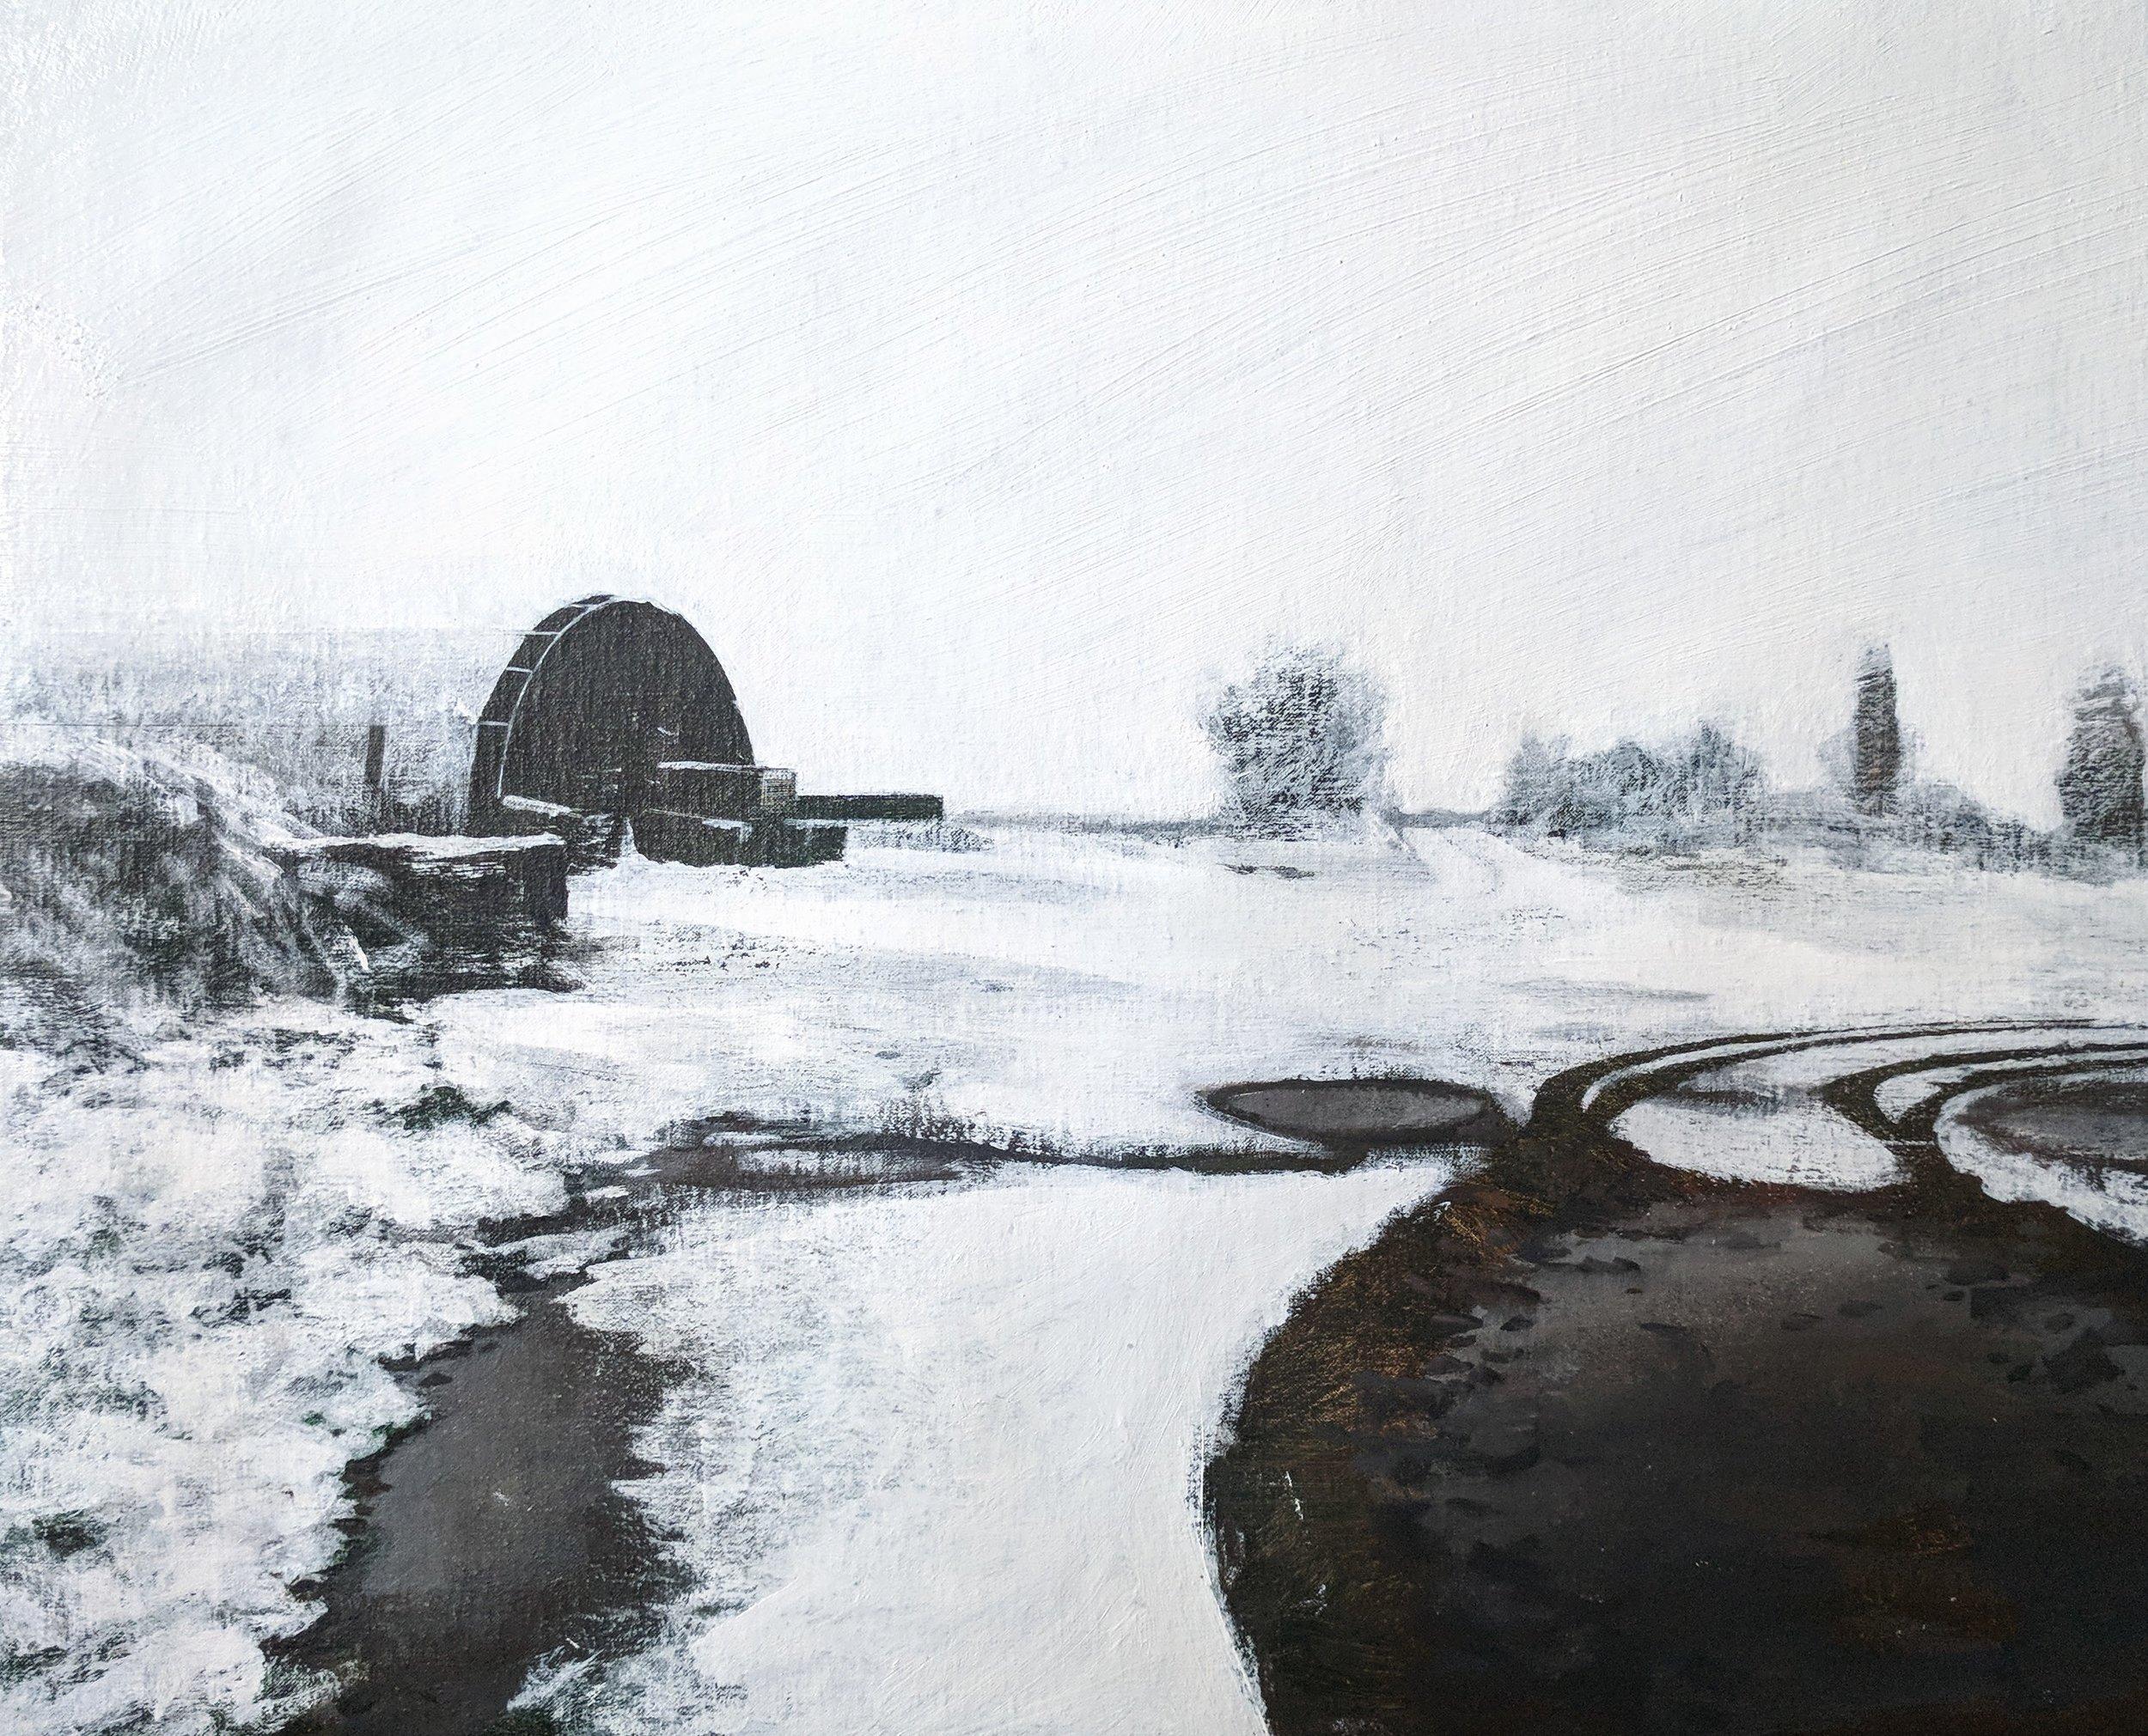 Ashby under snow